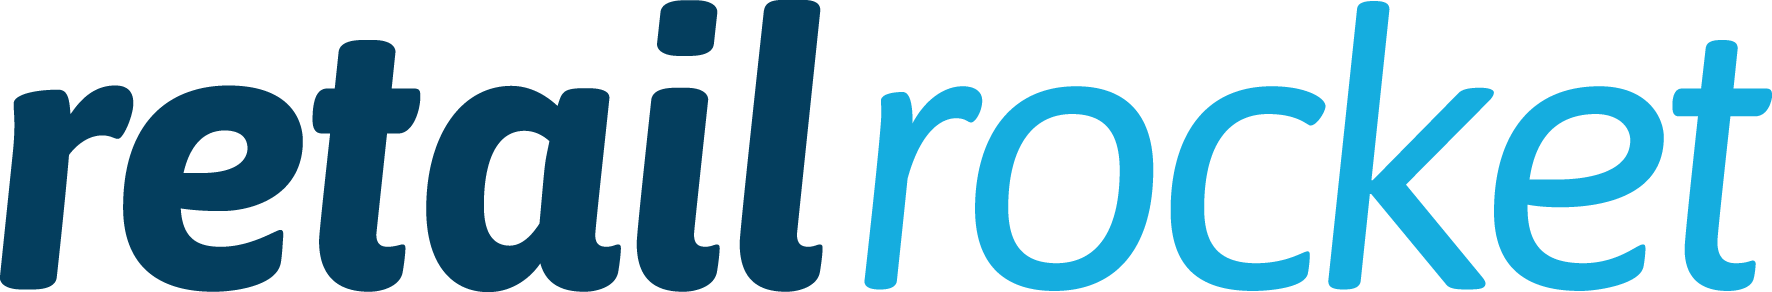 parcupc_entitat_retail-rocket.png